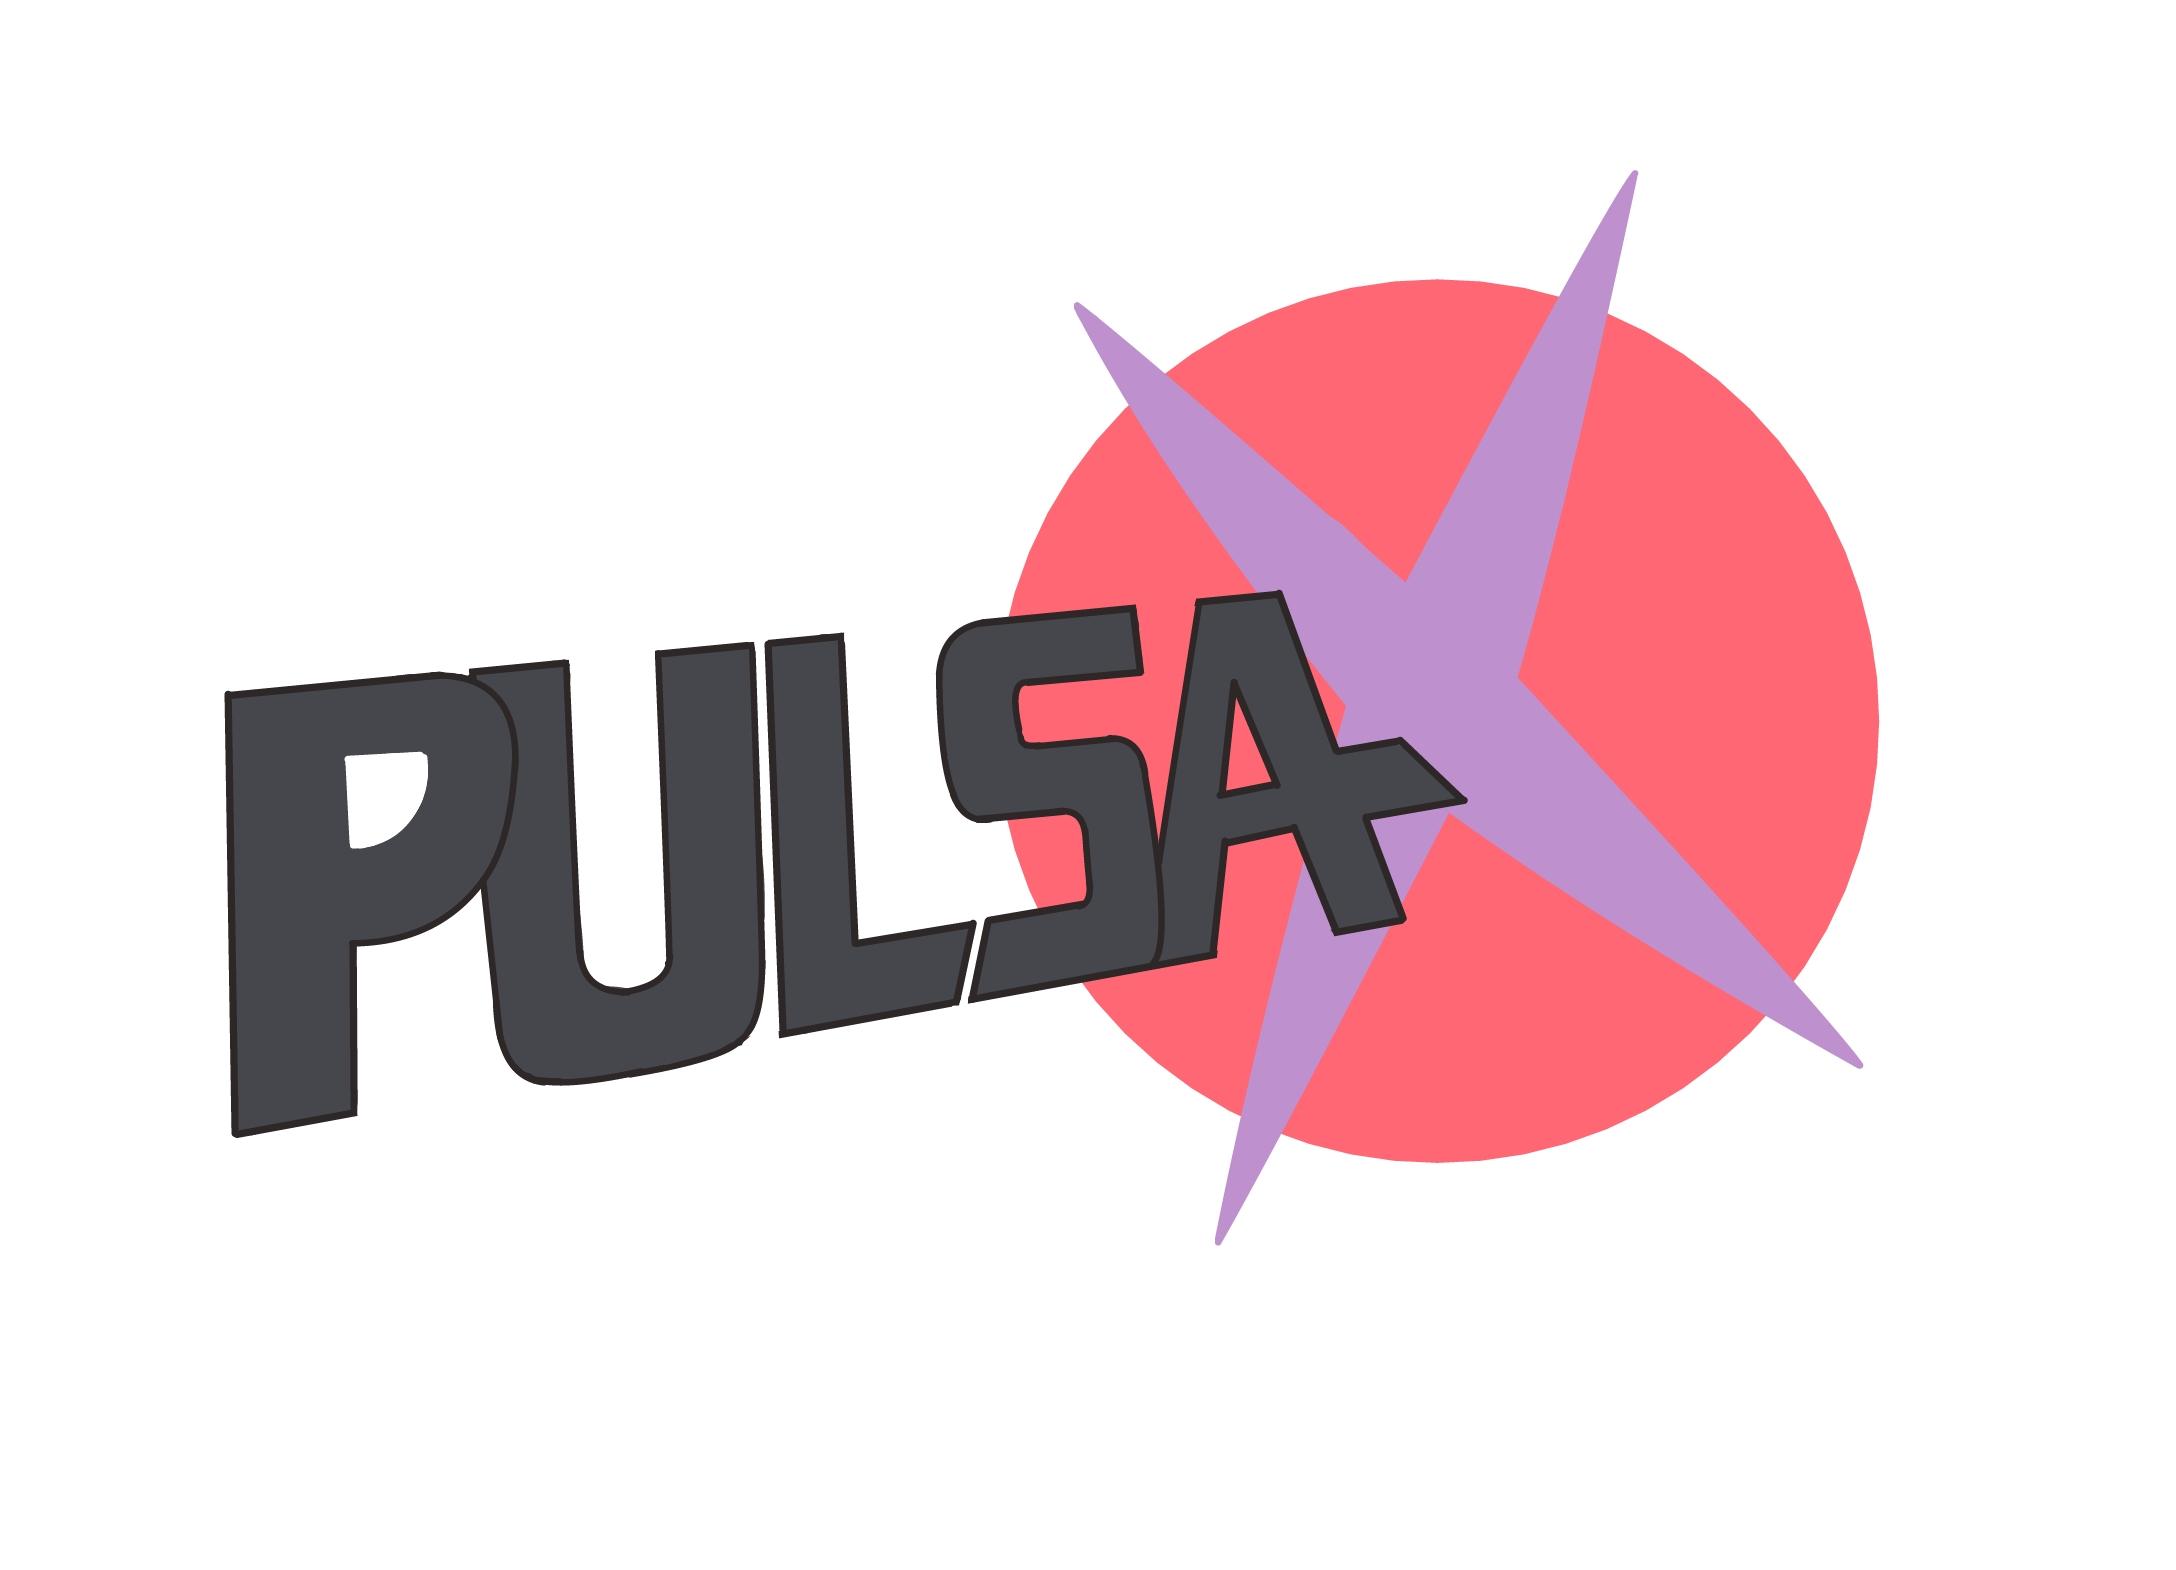 PULSAX-PROGRAMA13